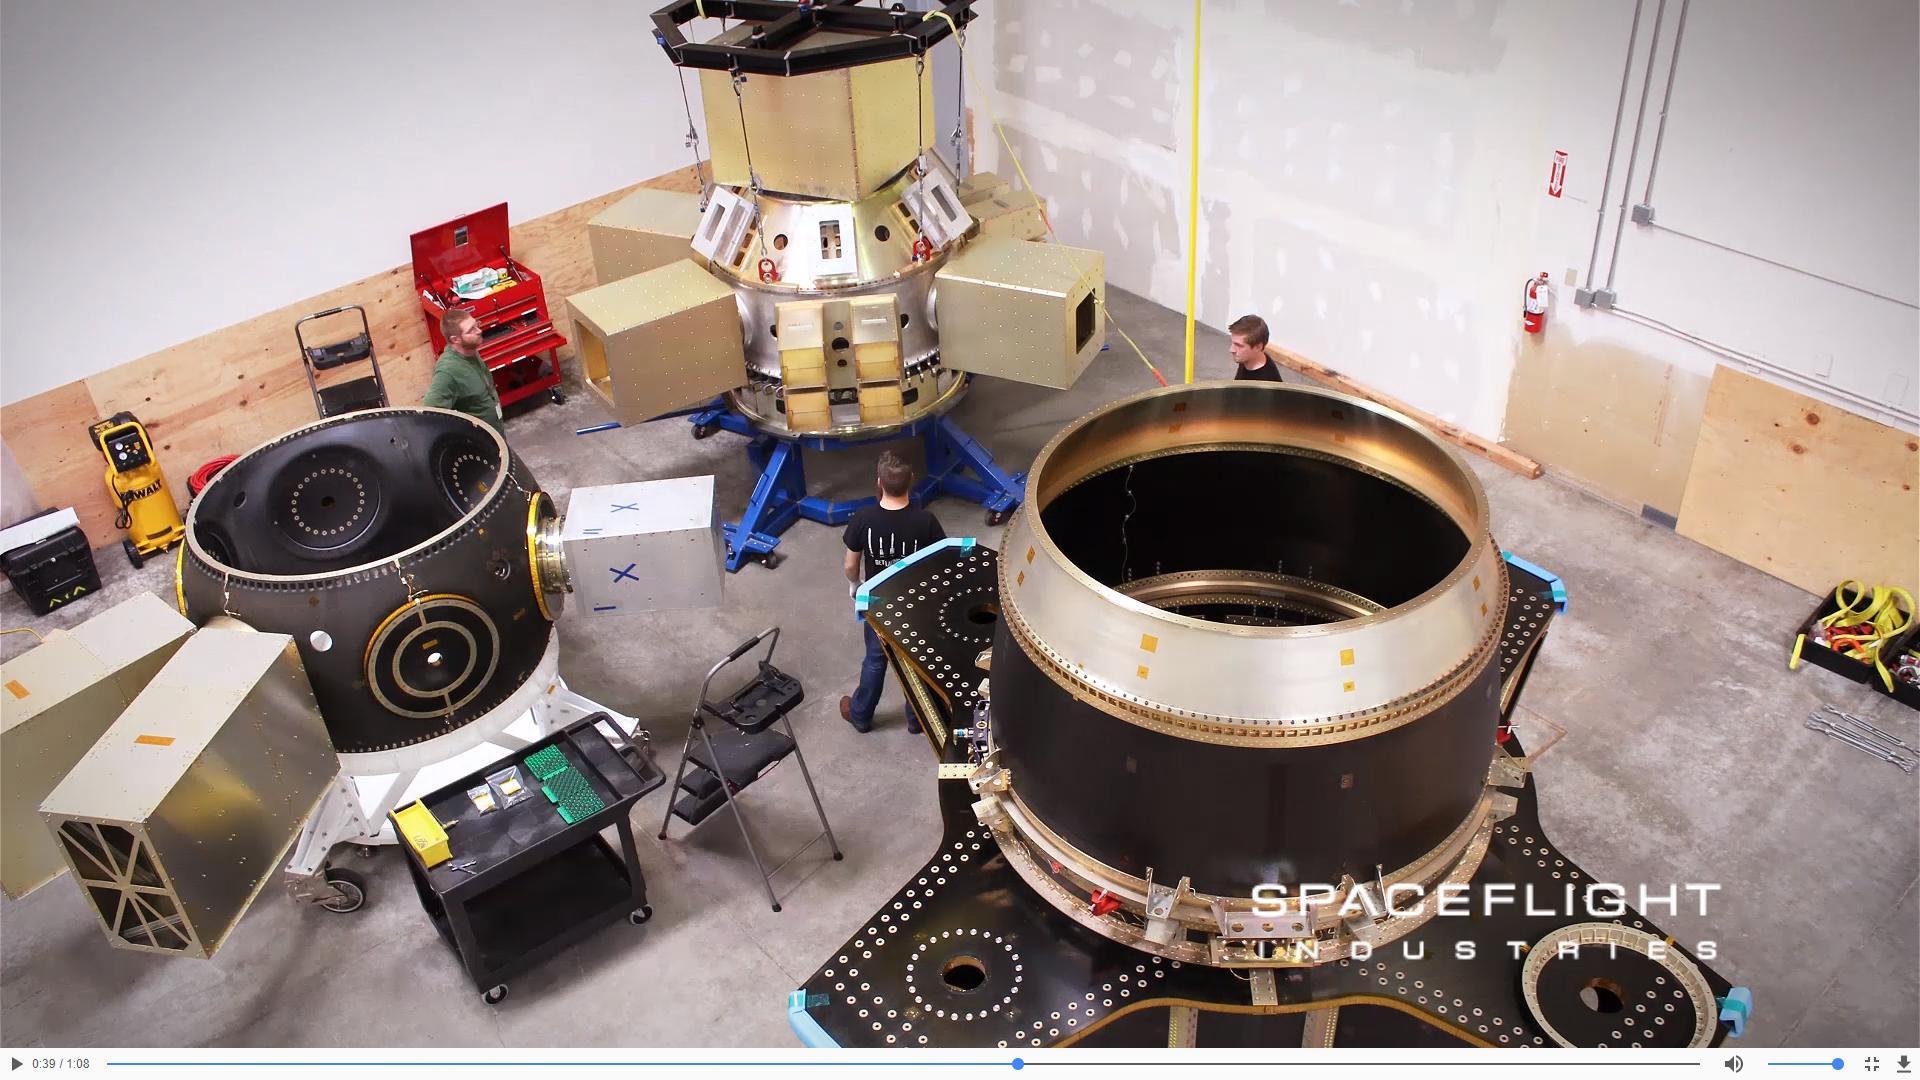 SSO-A preparation 2017 (Spaceflight Industries) 2